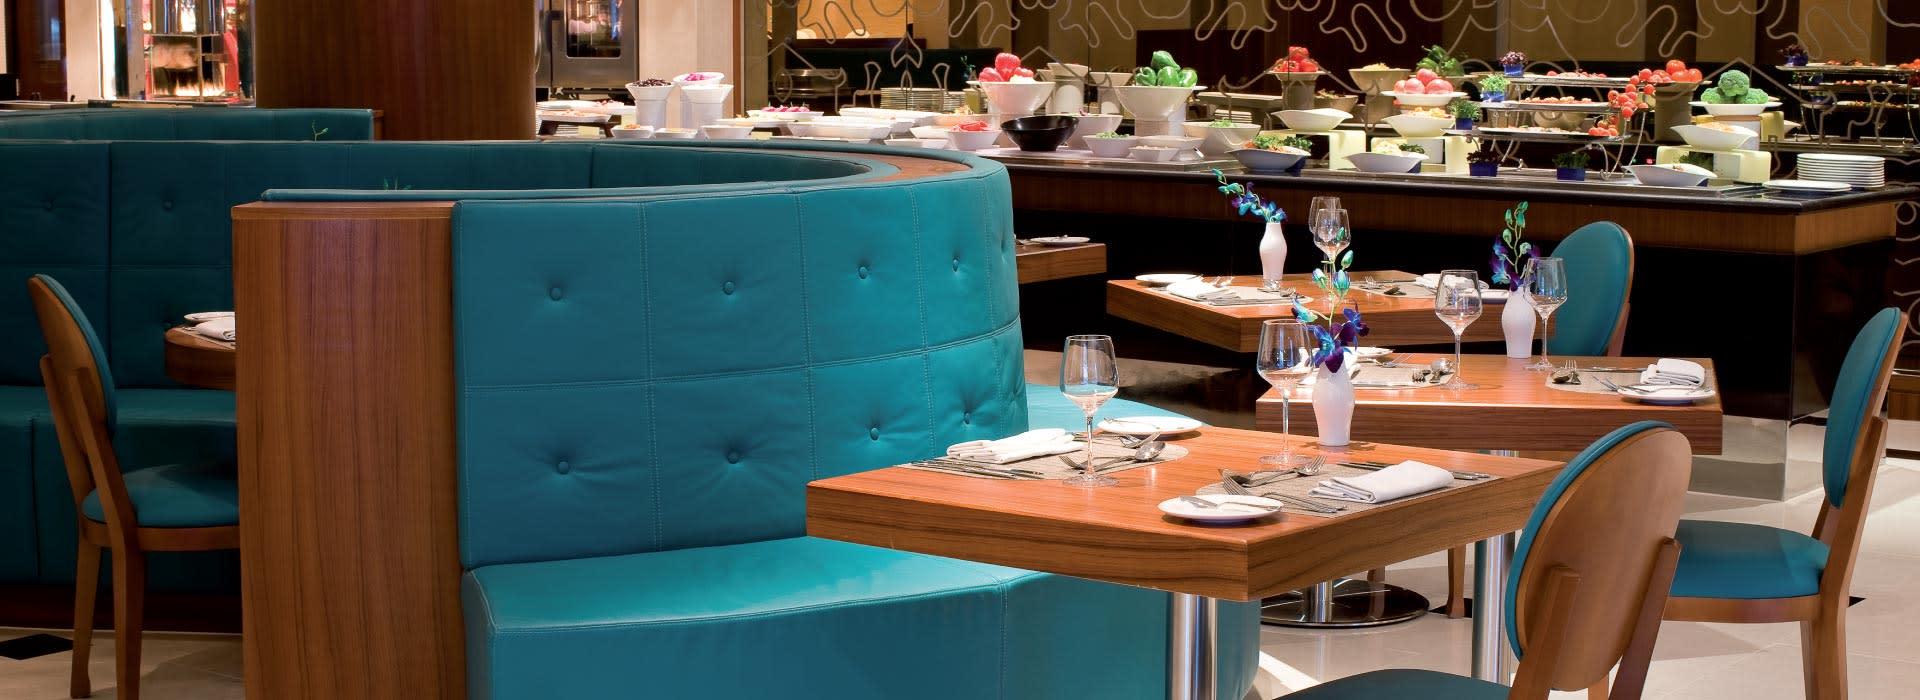 Jigsaw fine dining restaurant at AVANI Deira Dubai